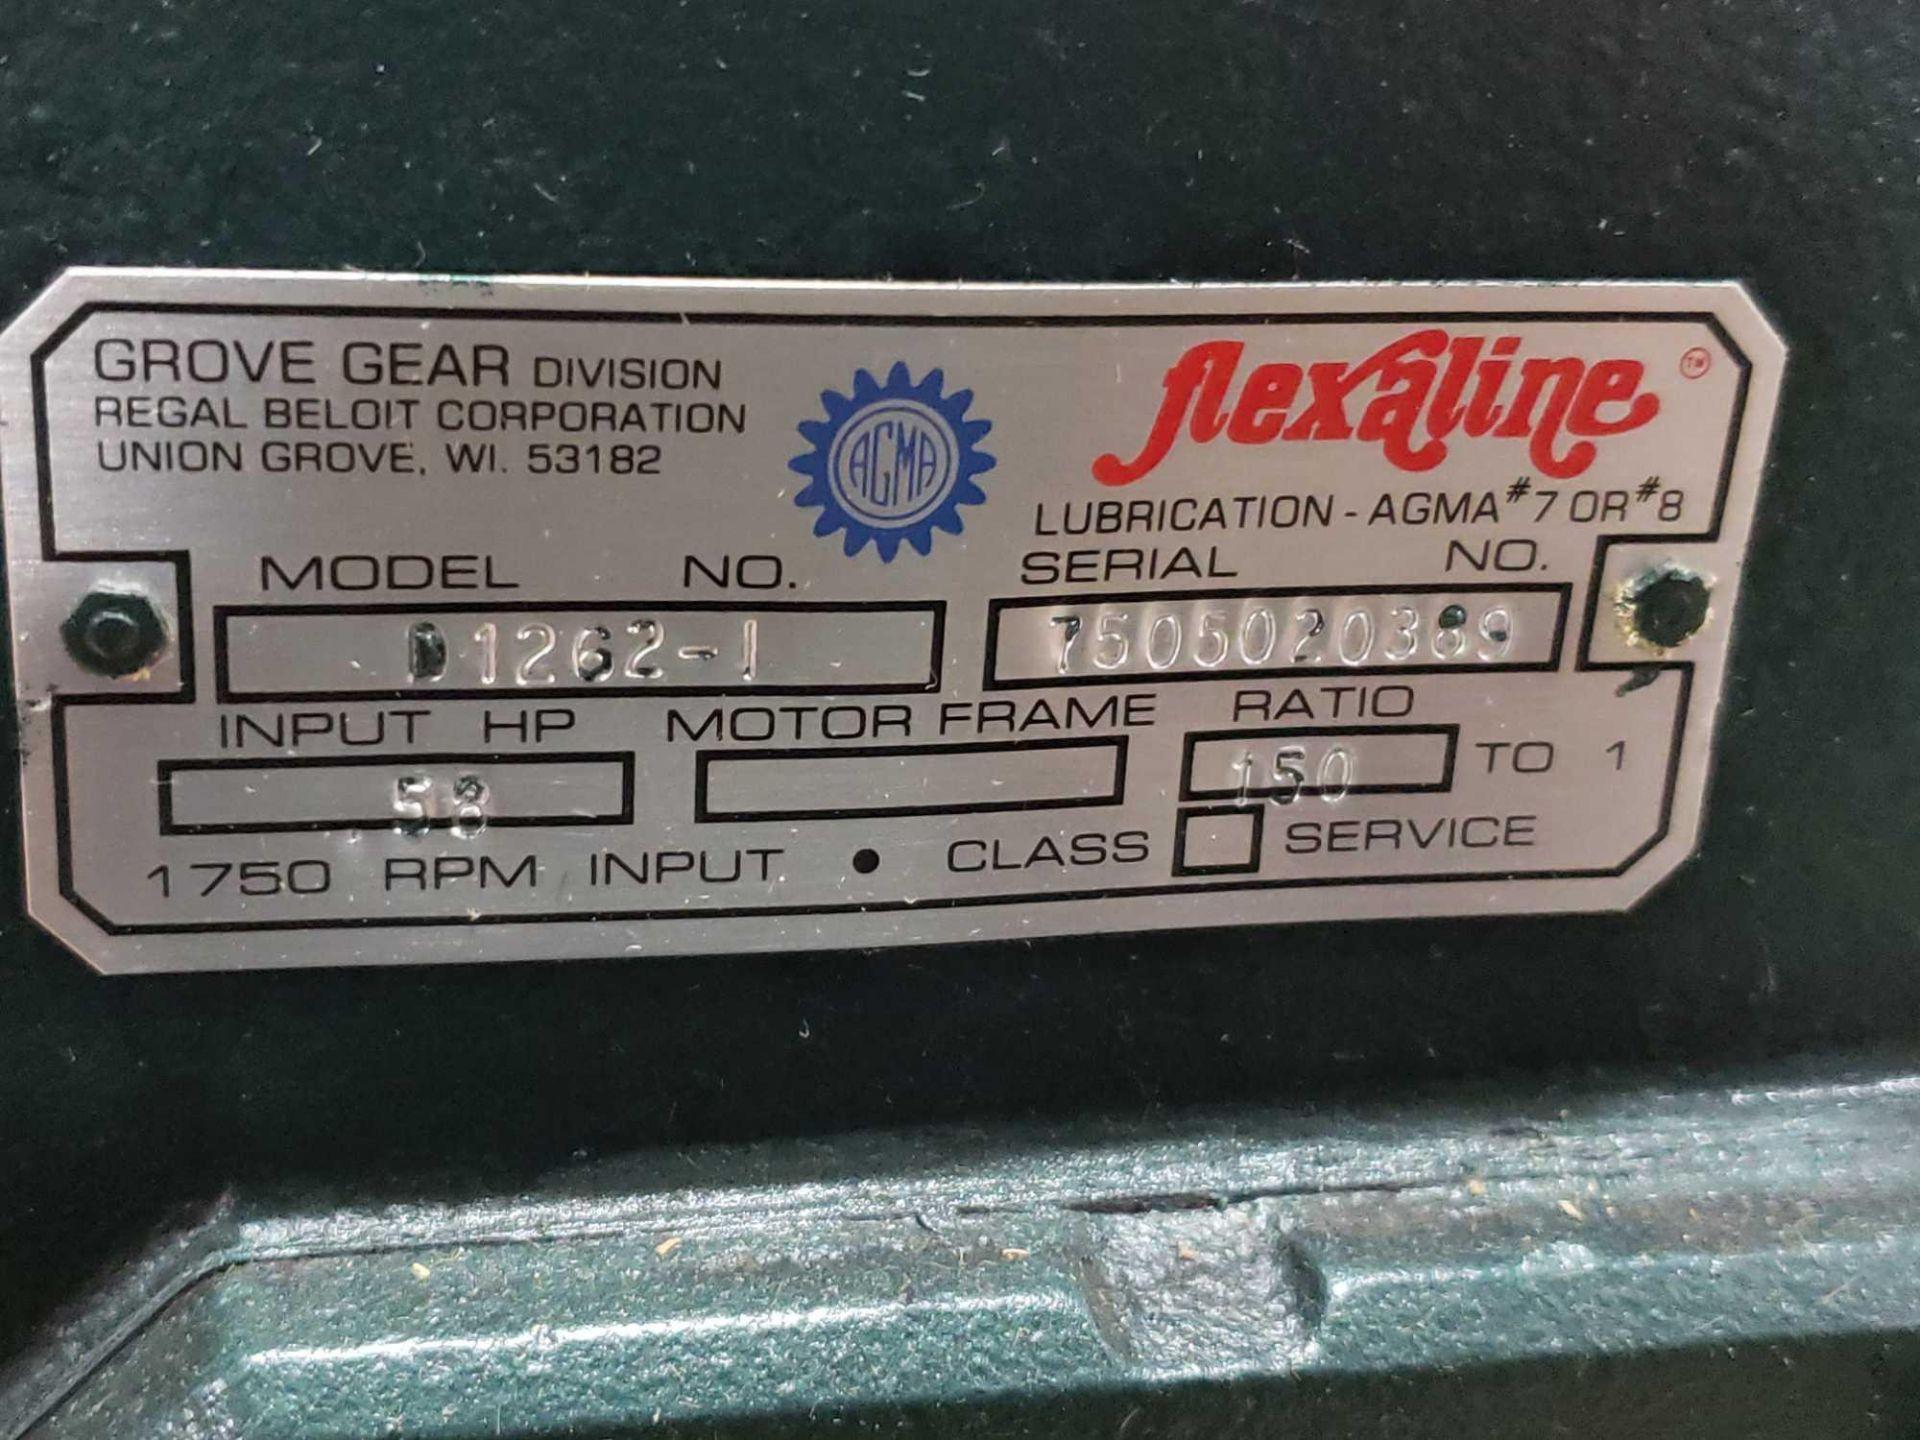 Lot 52 - Grove Gear Flexaline gearbox worm gear speed reducer model D1262-1, ratio 150:1. New in box.